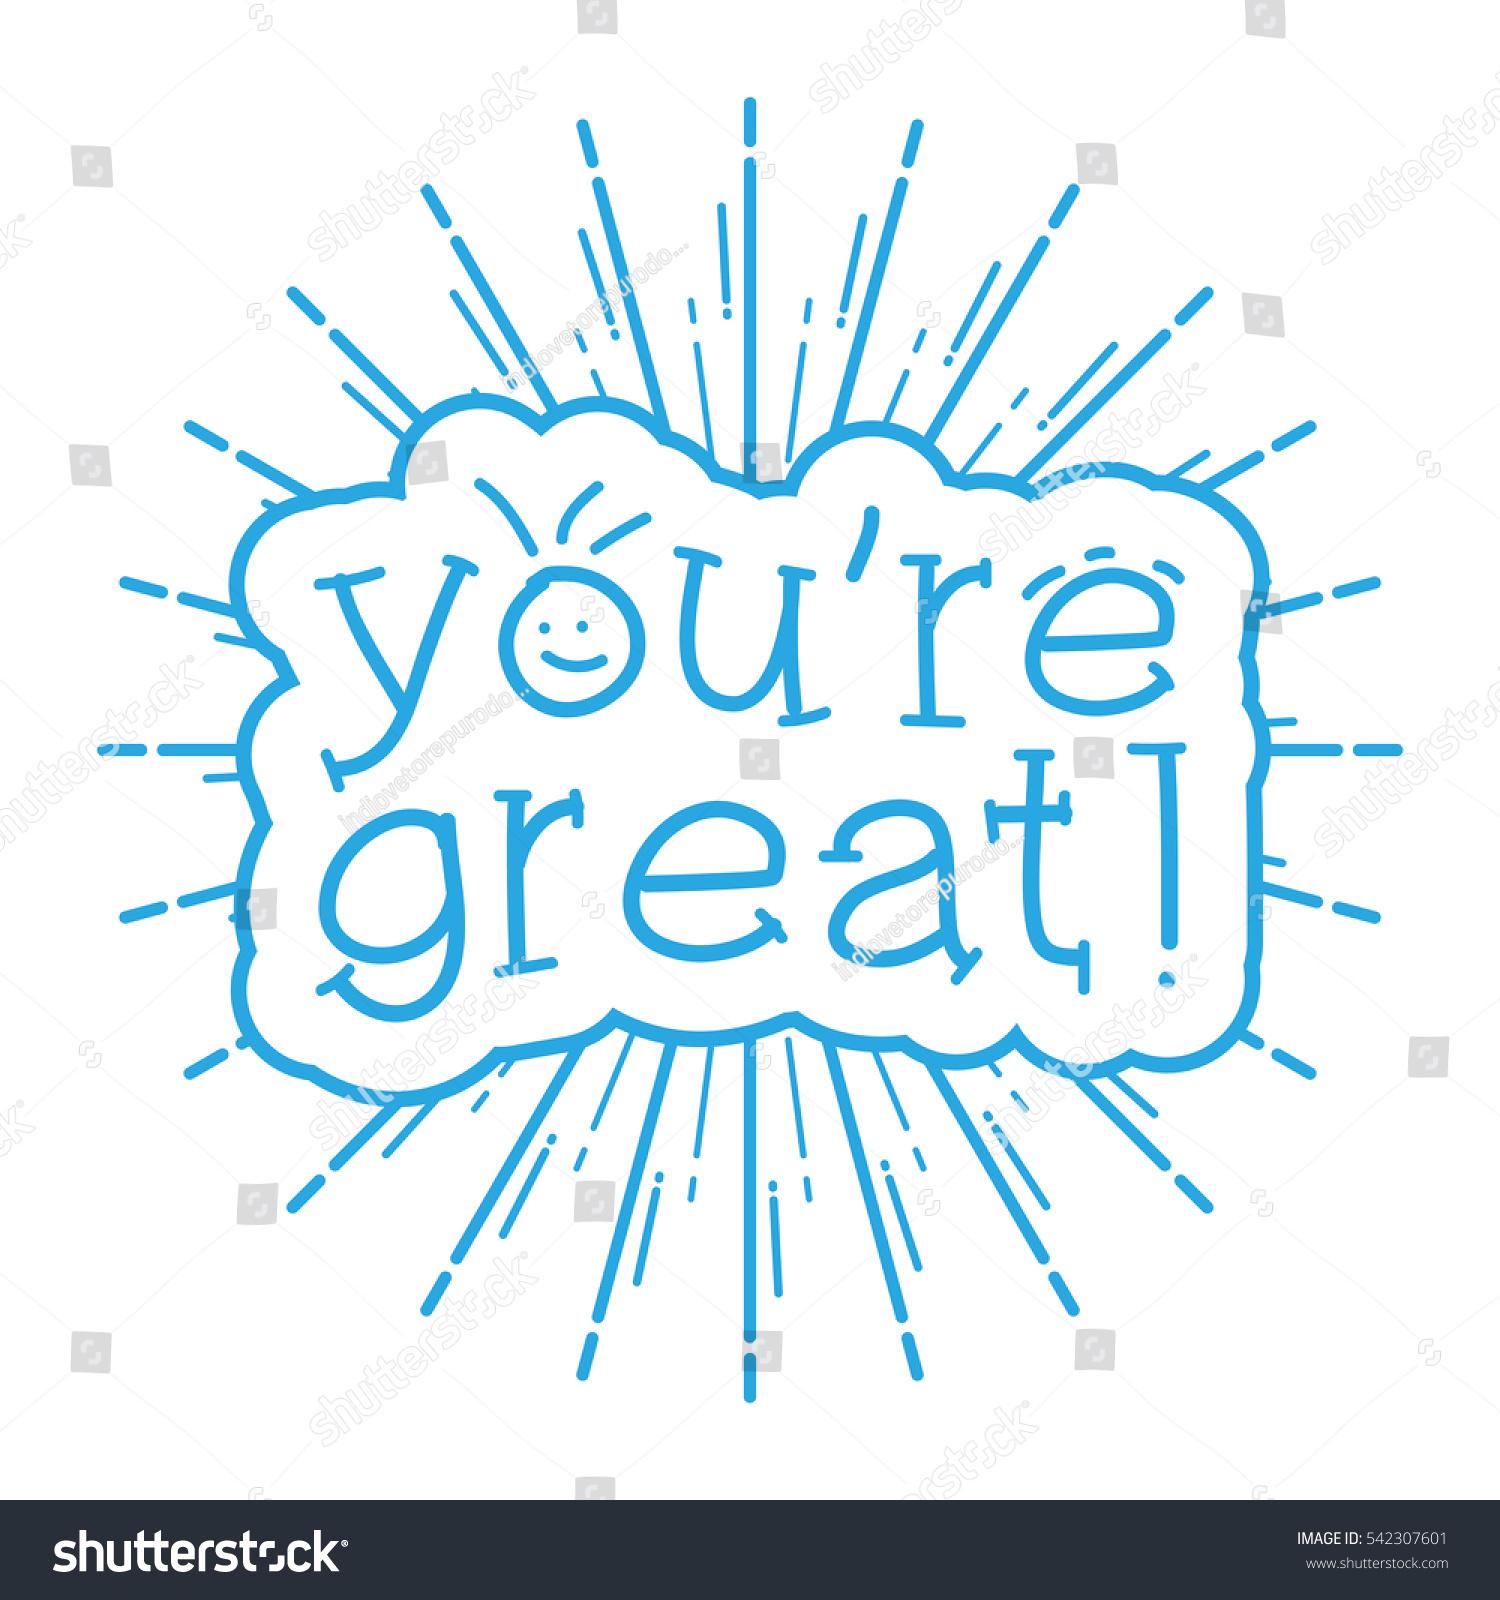 Motivational Phrases You Great Motivational Phrases Vintage Sunburst Stock Vector